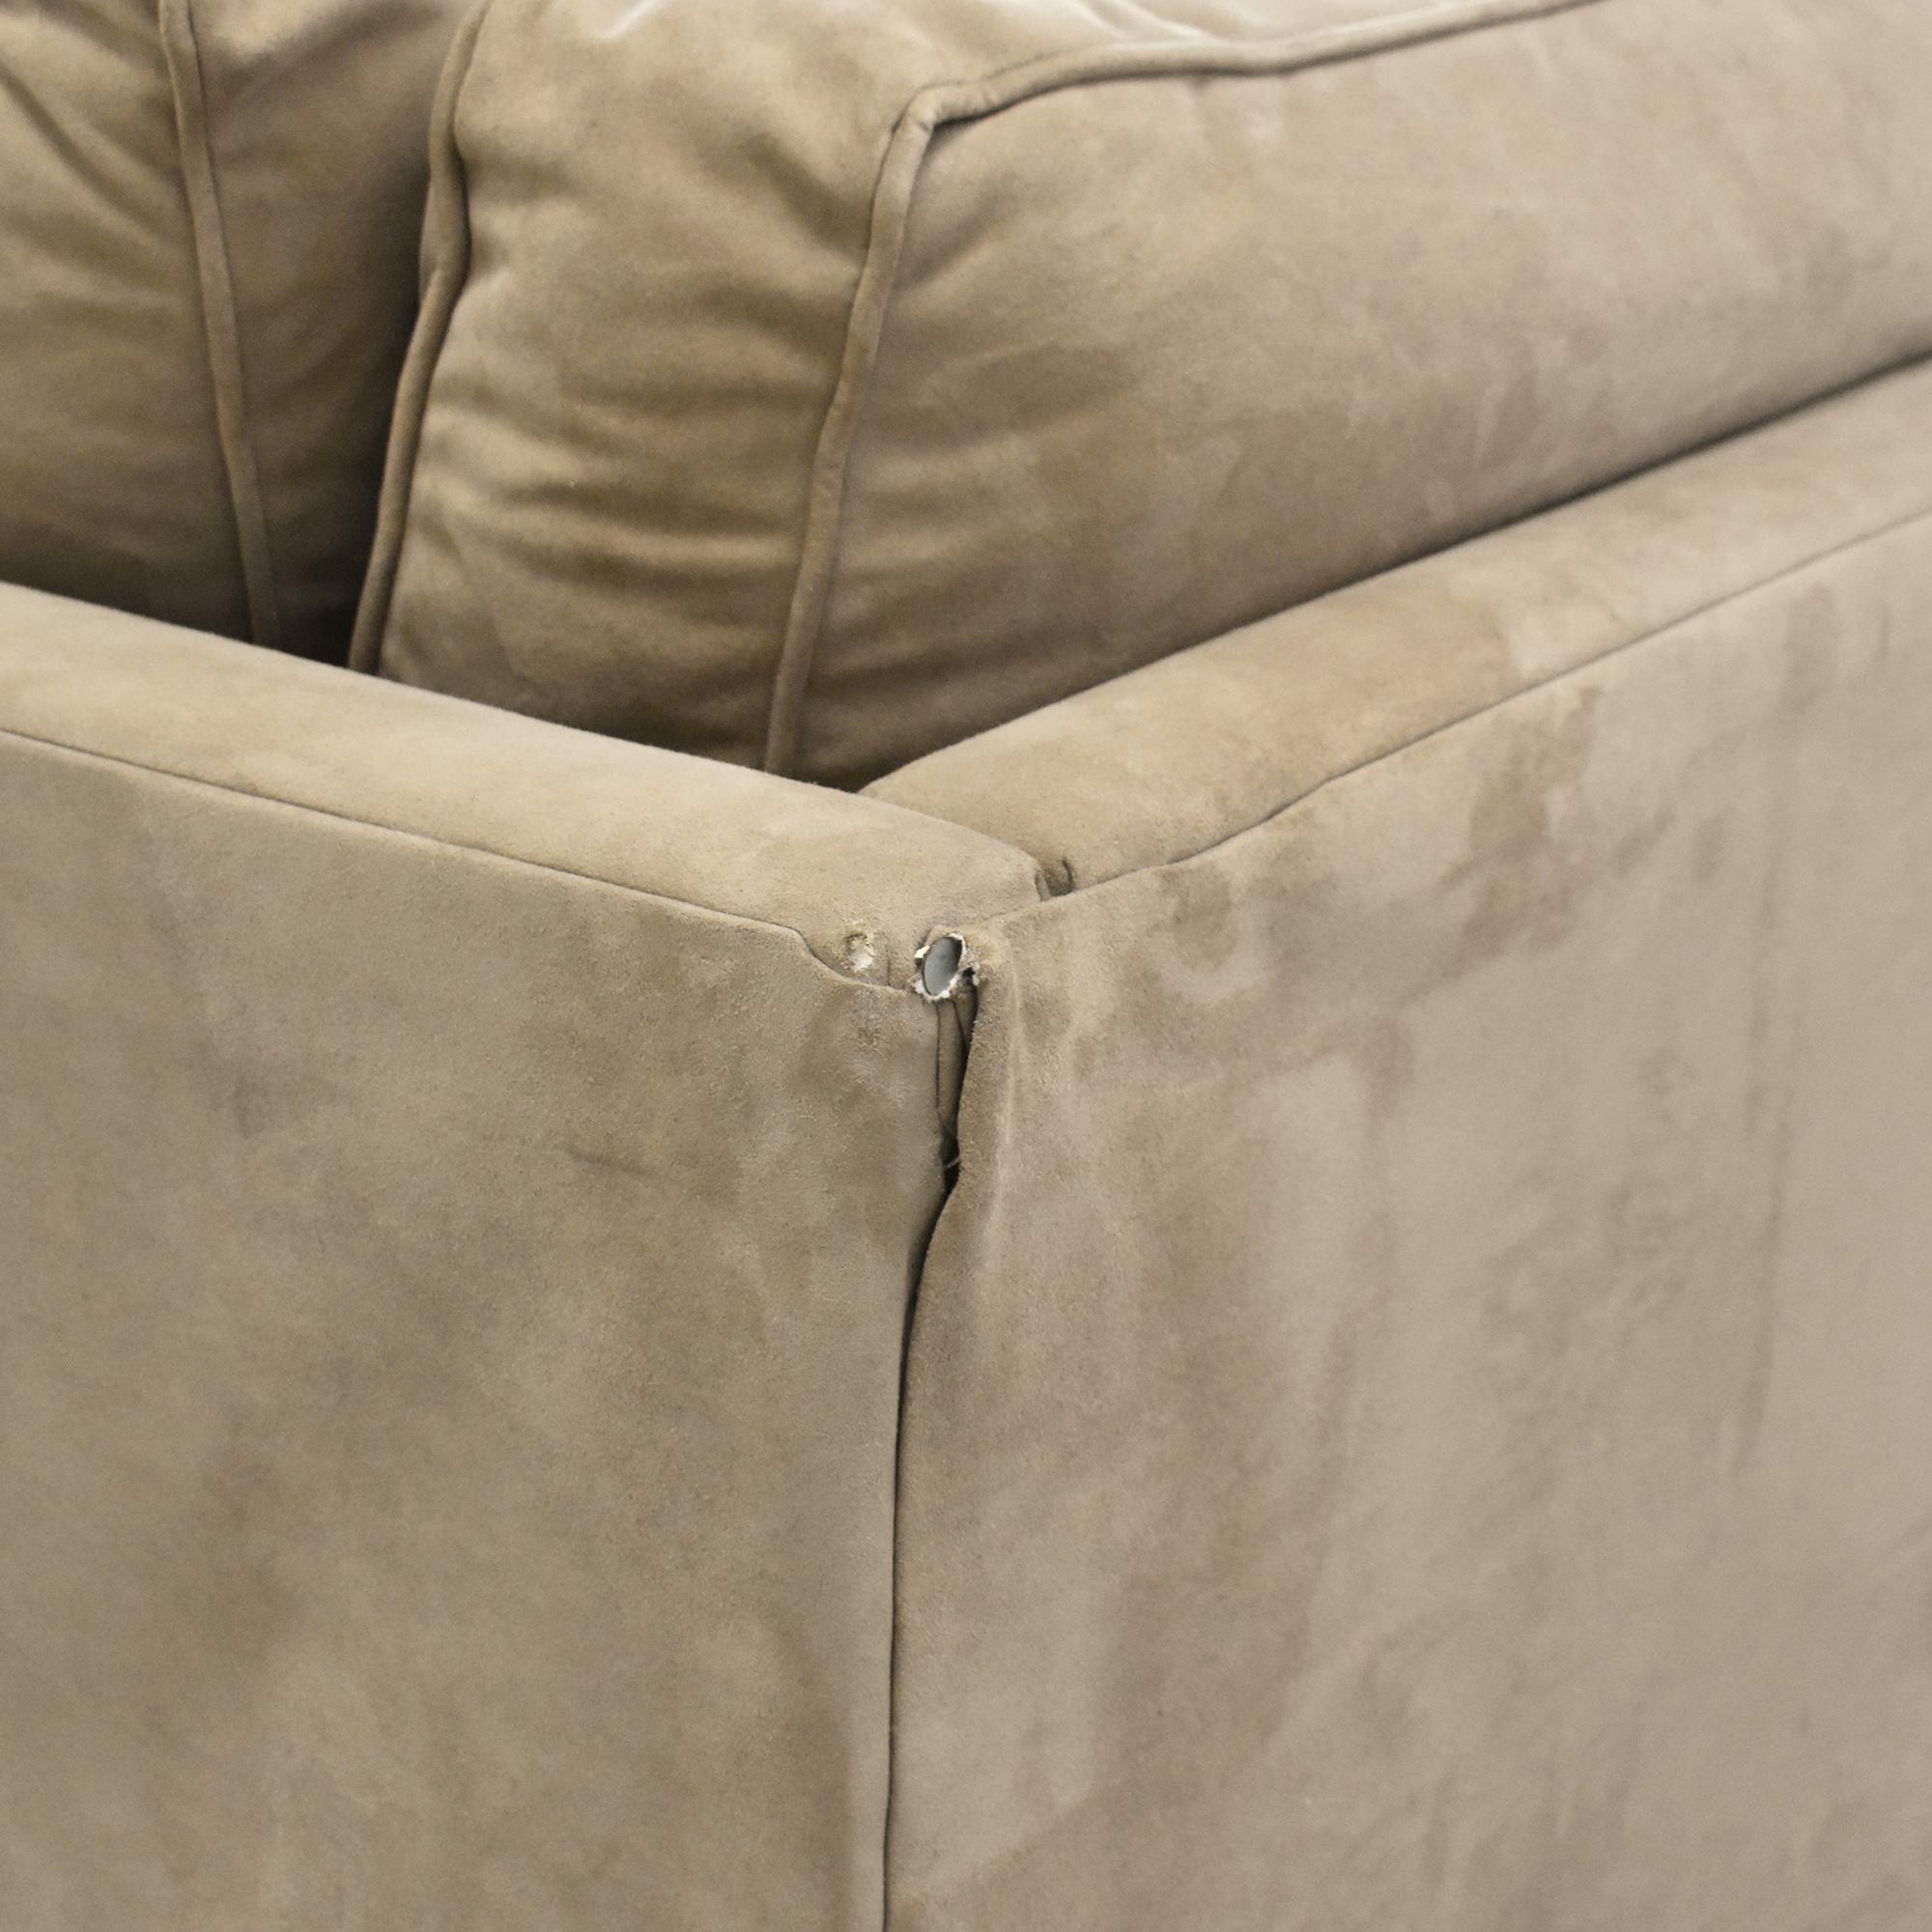 Macy's Macy's Chaise Sectional Sleeper Sofa with Ottoman nyc